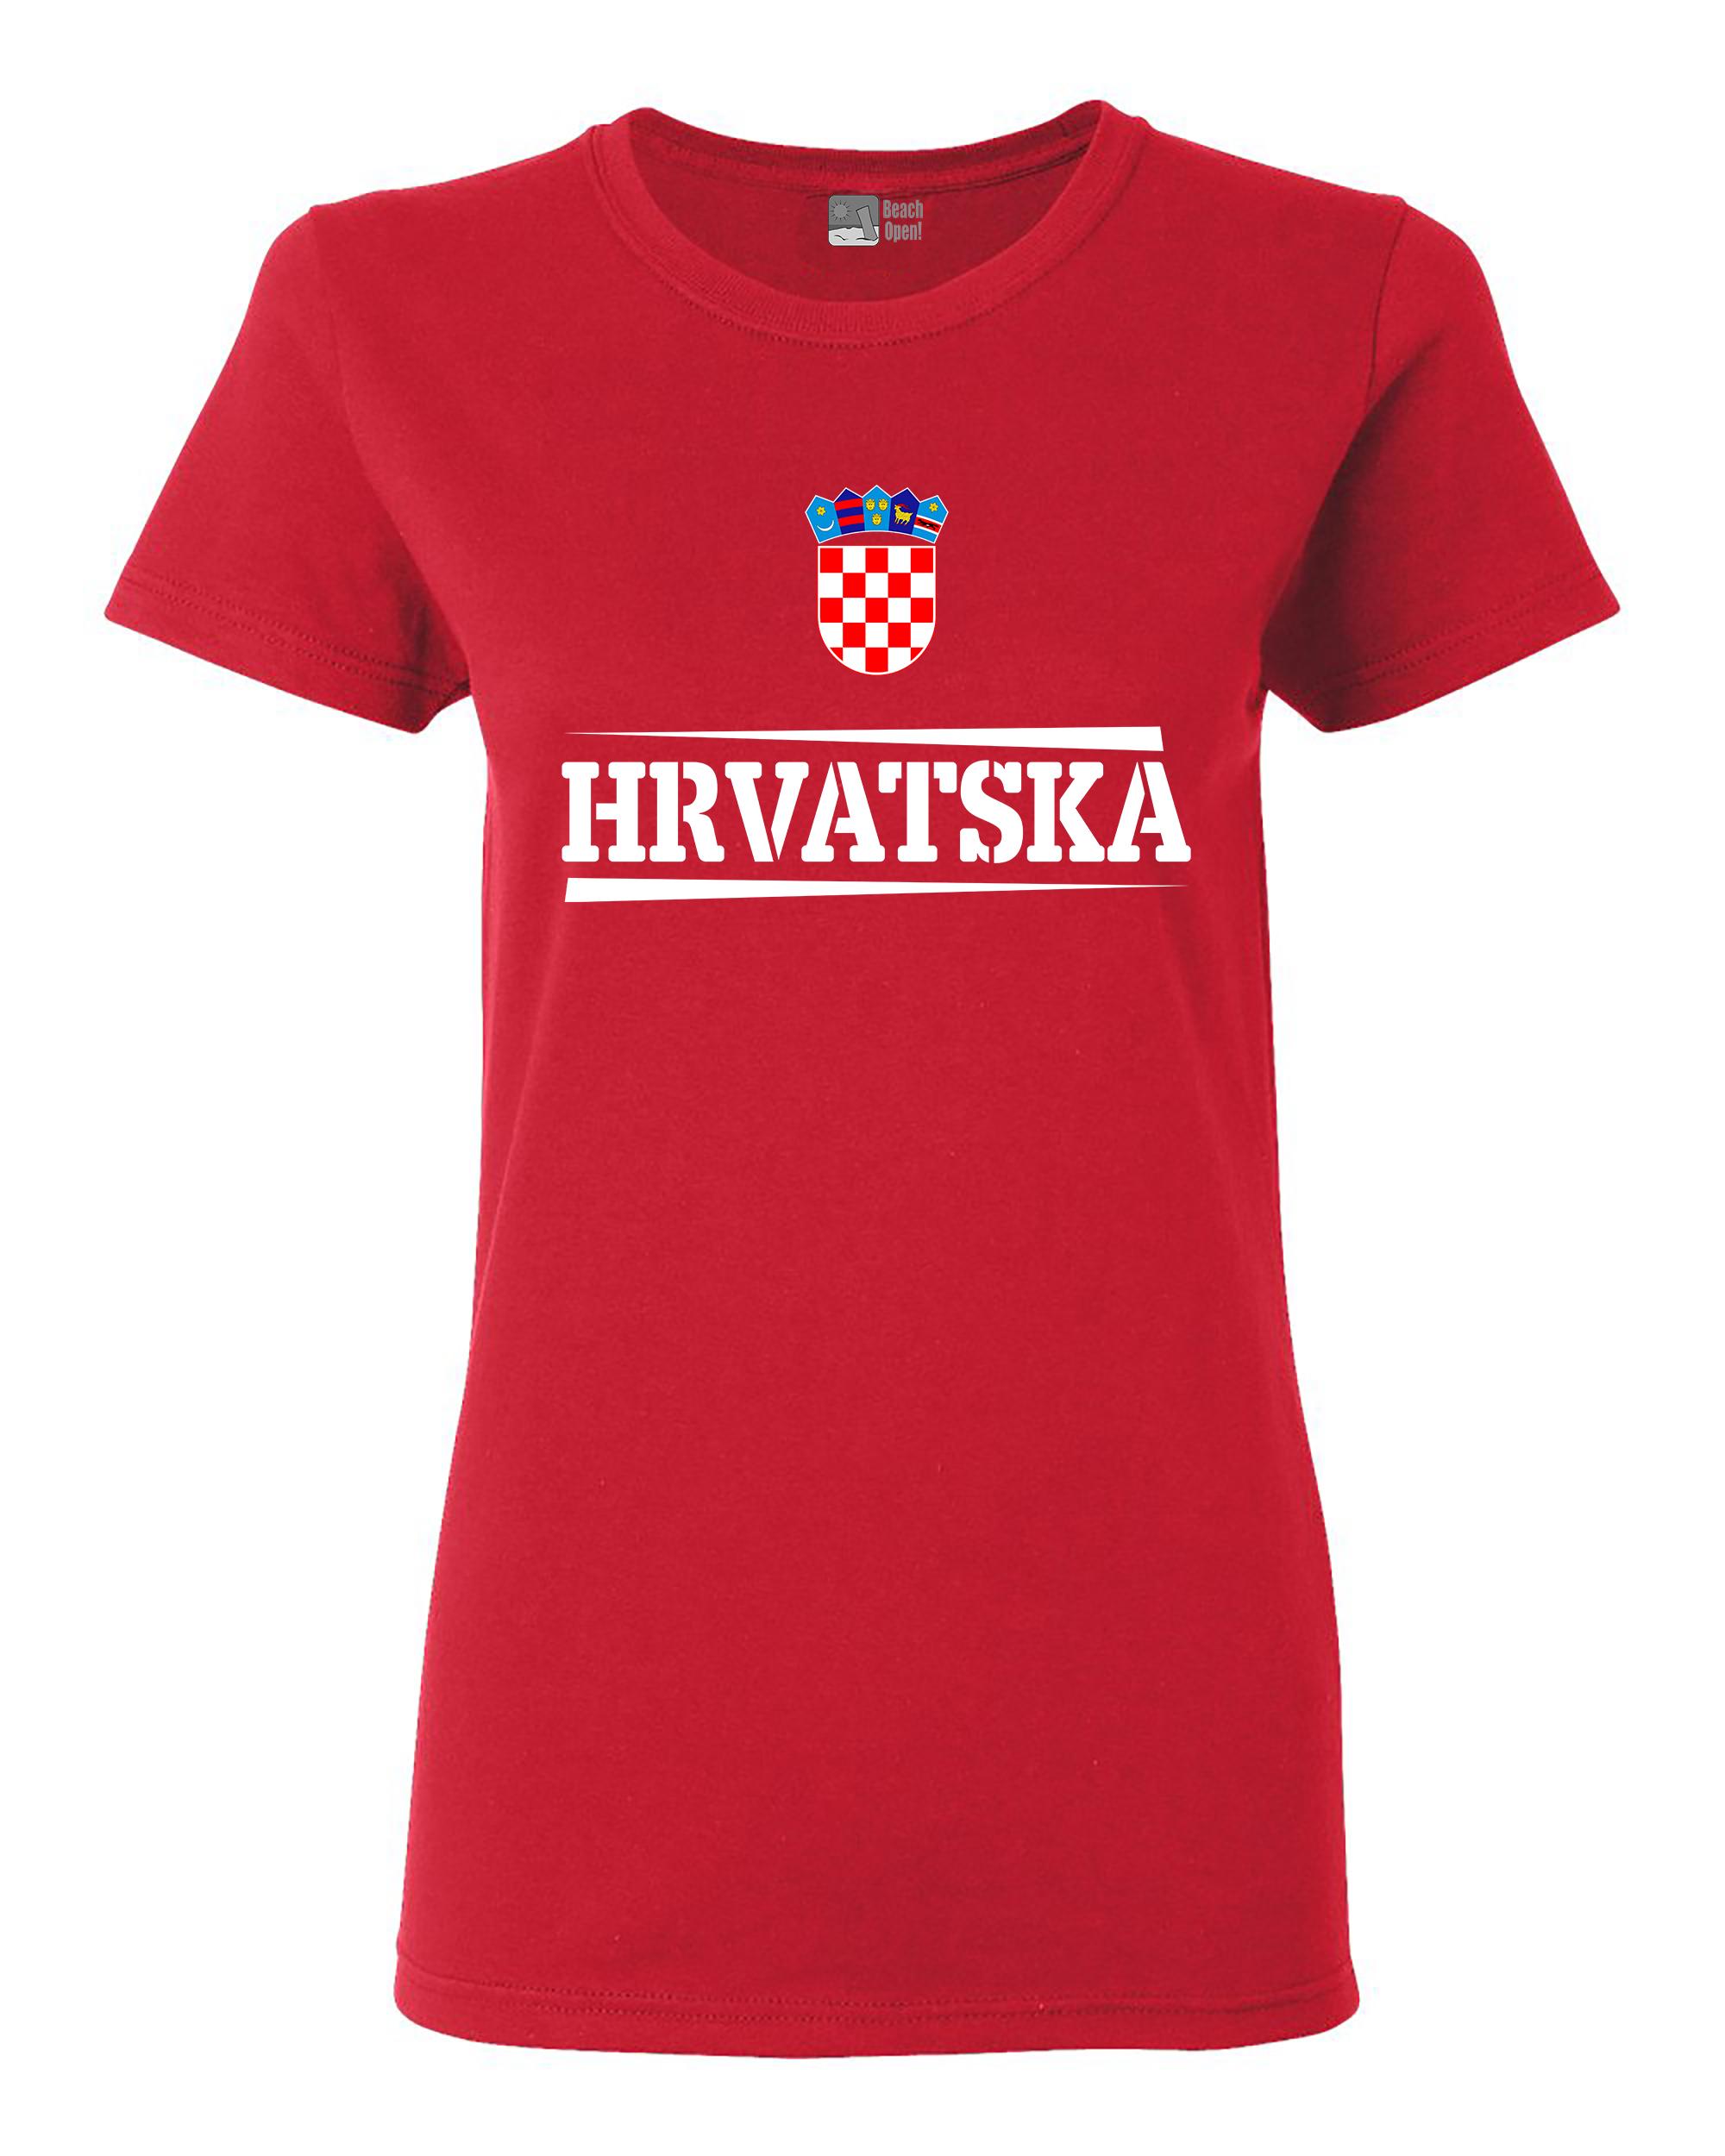 Ladies The World Hrvatska Croatia Football Soccer Team Sports DT T-Shirt Tee